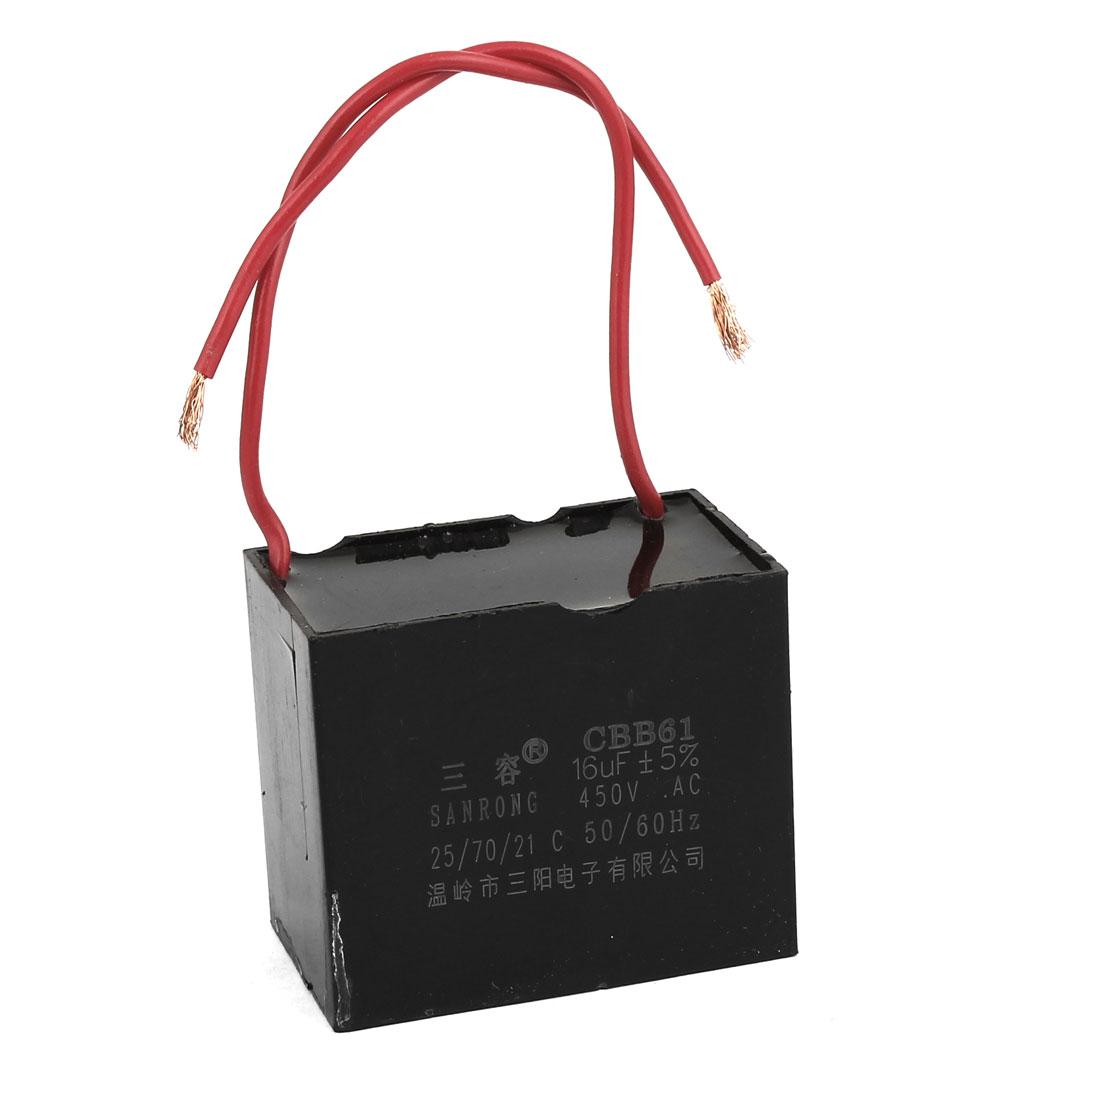 CBB61 16uF AC 450V Metallized Polypropylene Film Motor Run Capacitor Black